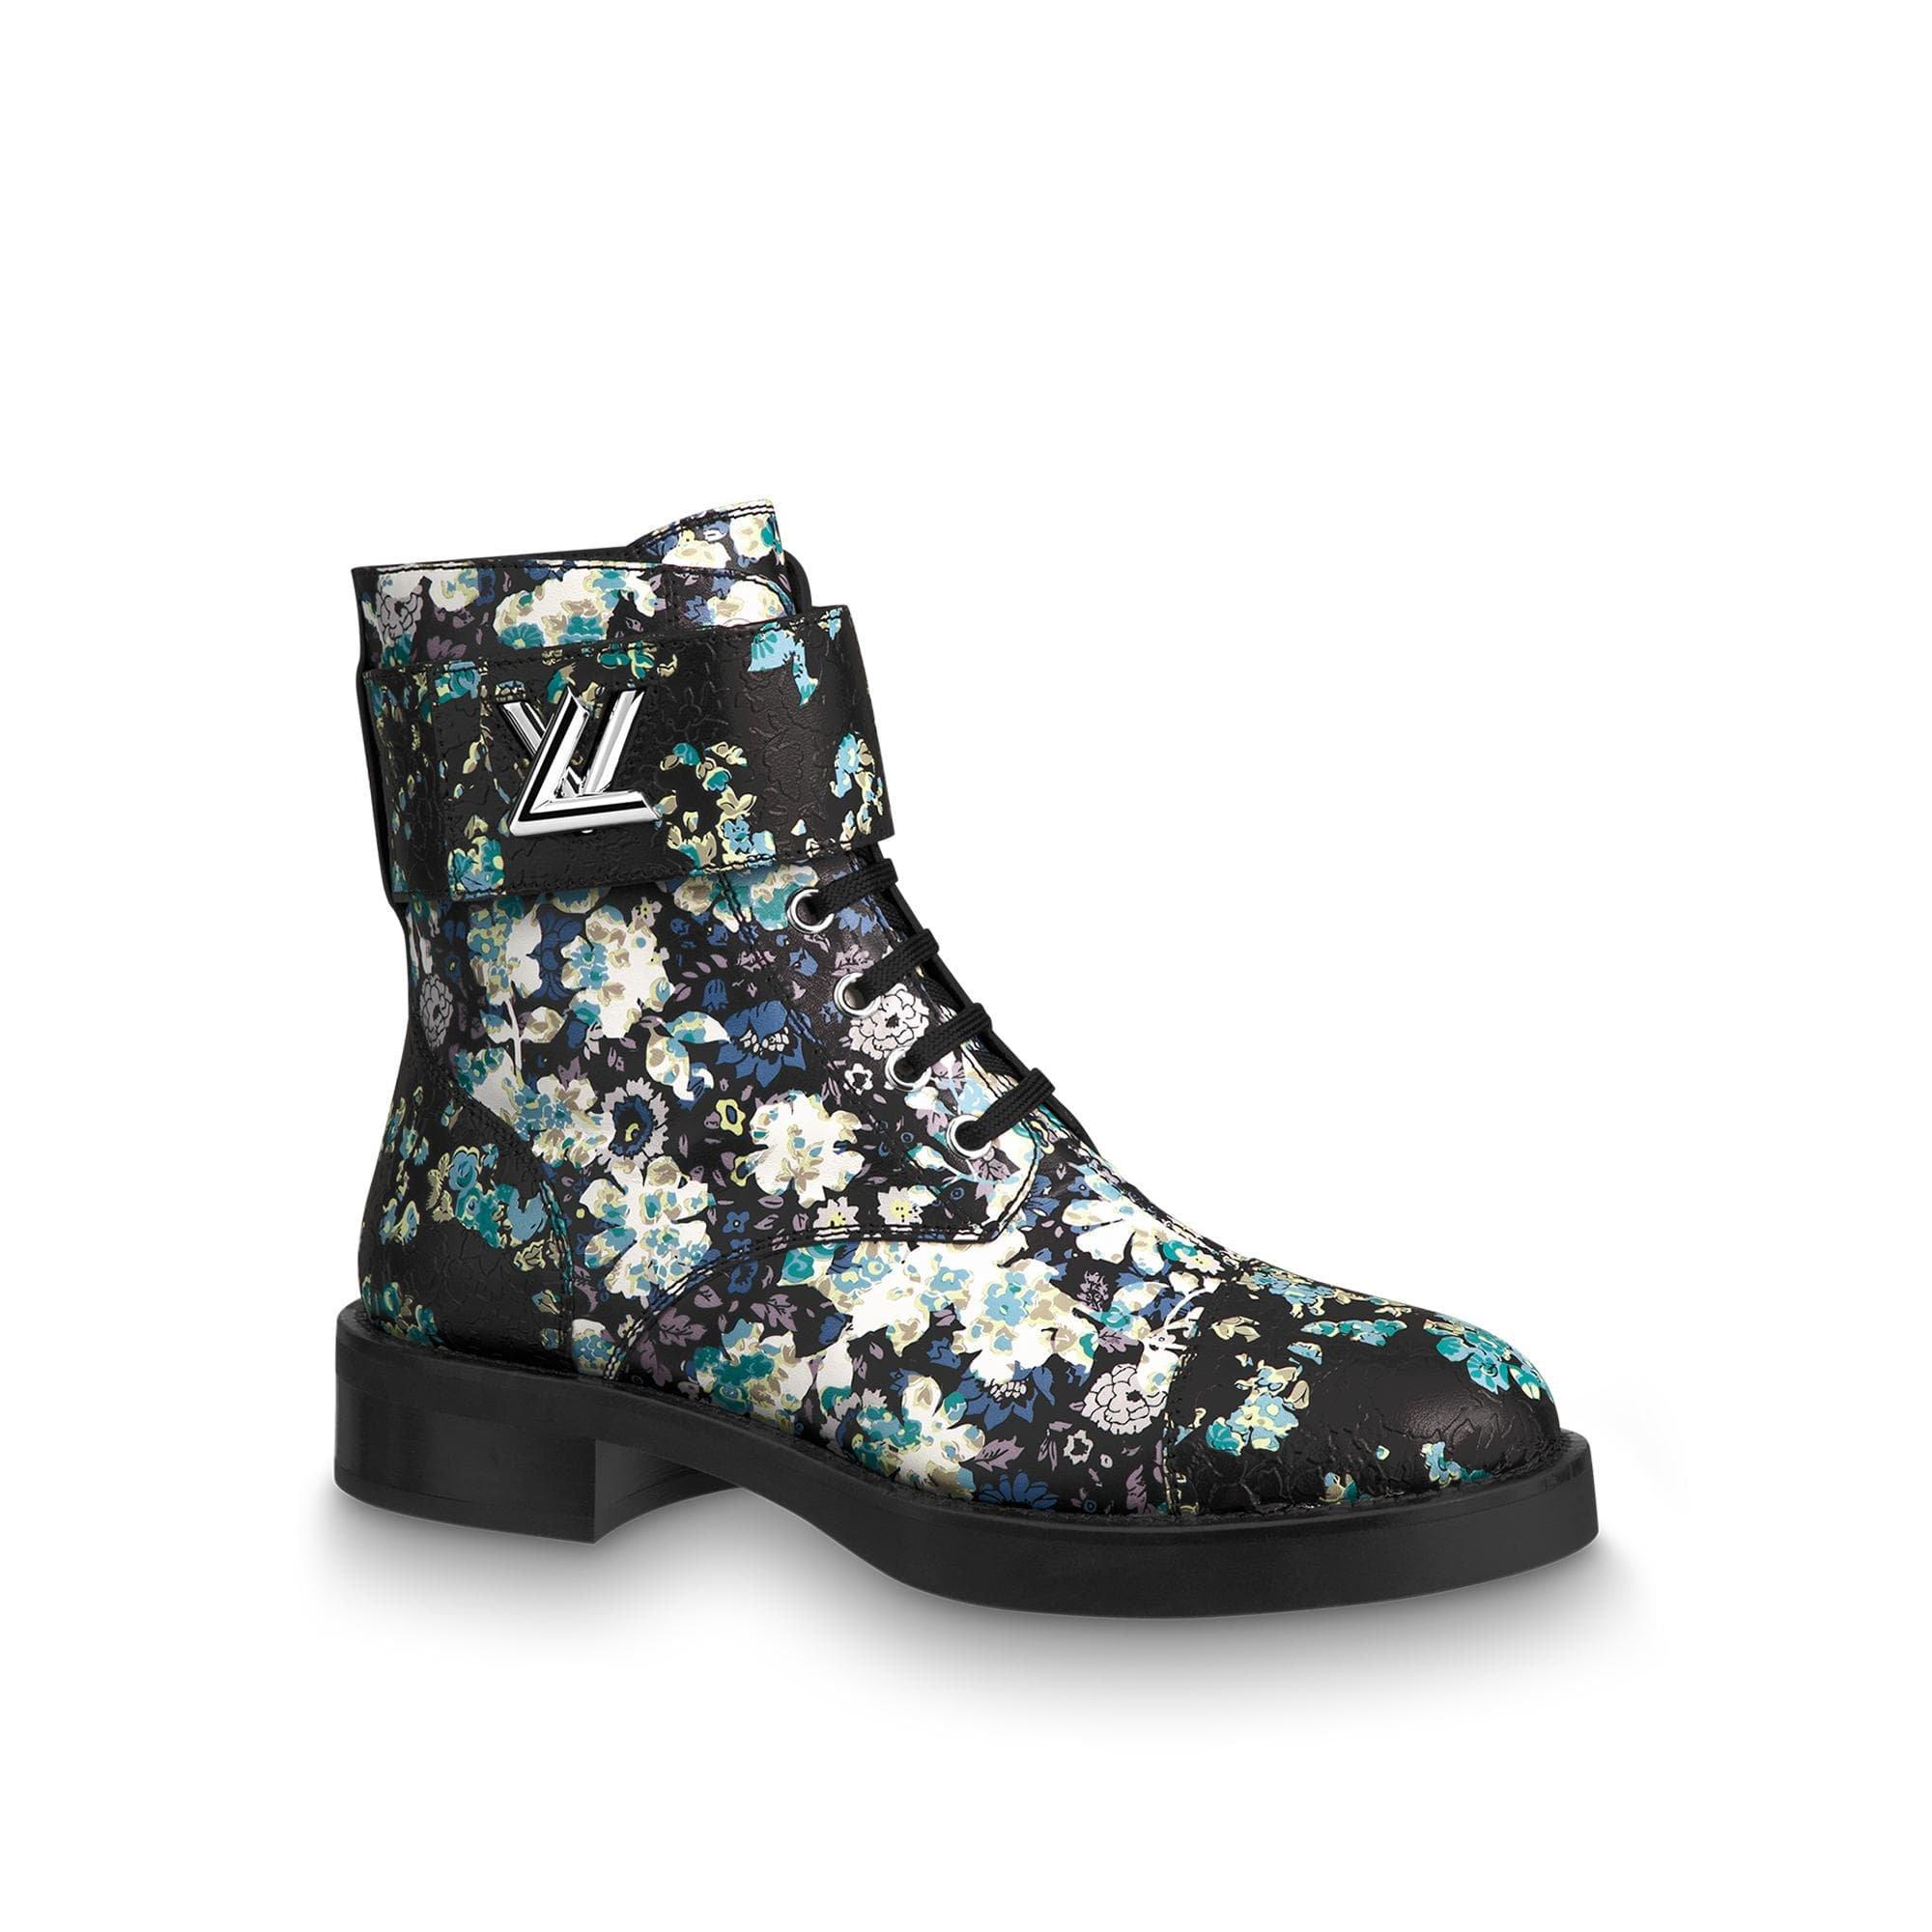 Wonderland Flat Rangers - Shoes | LOUIS VUITTON